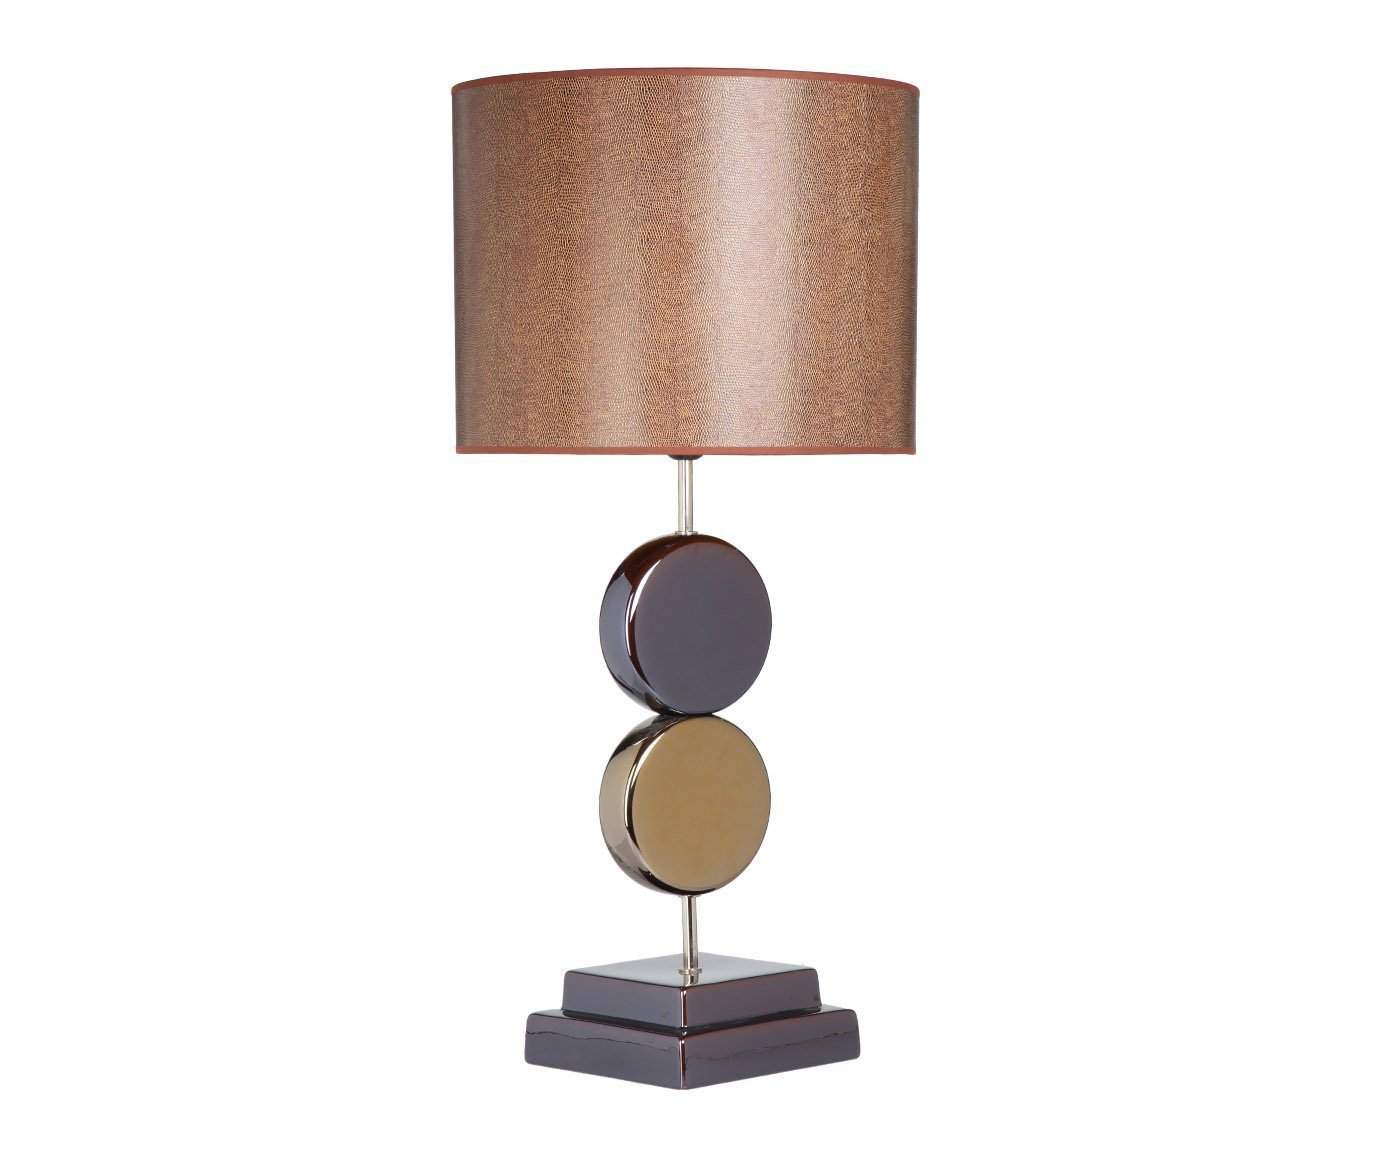 Лампы настольные Элитная лампа настольная Gold большая от Sporvil nastolnaya-lampa-bolshaya-gold-ot-sporvil-iz-portugalii.jpg